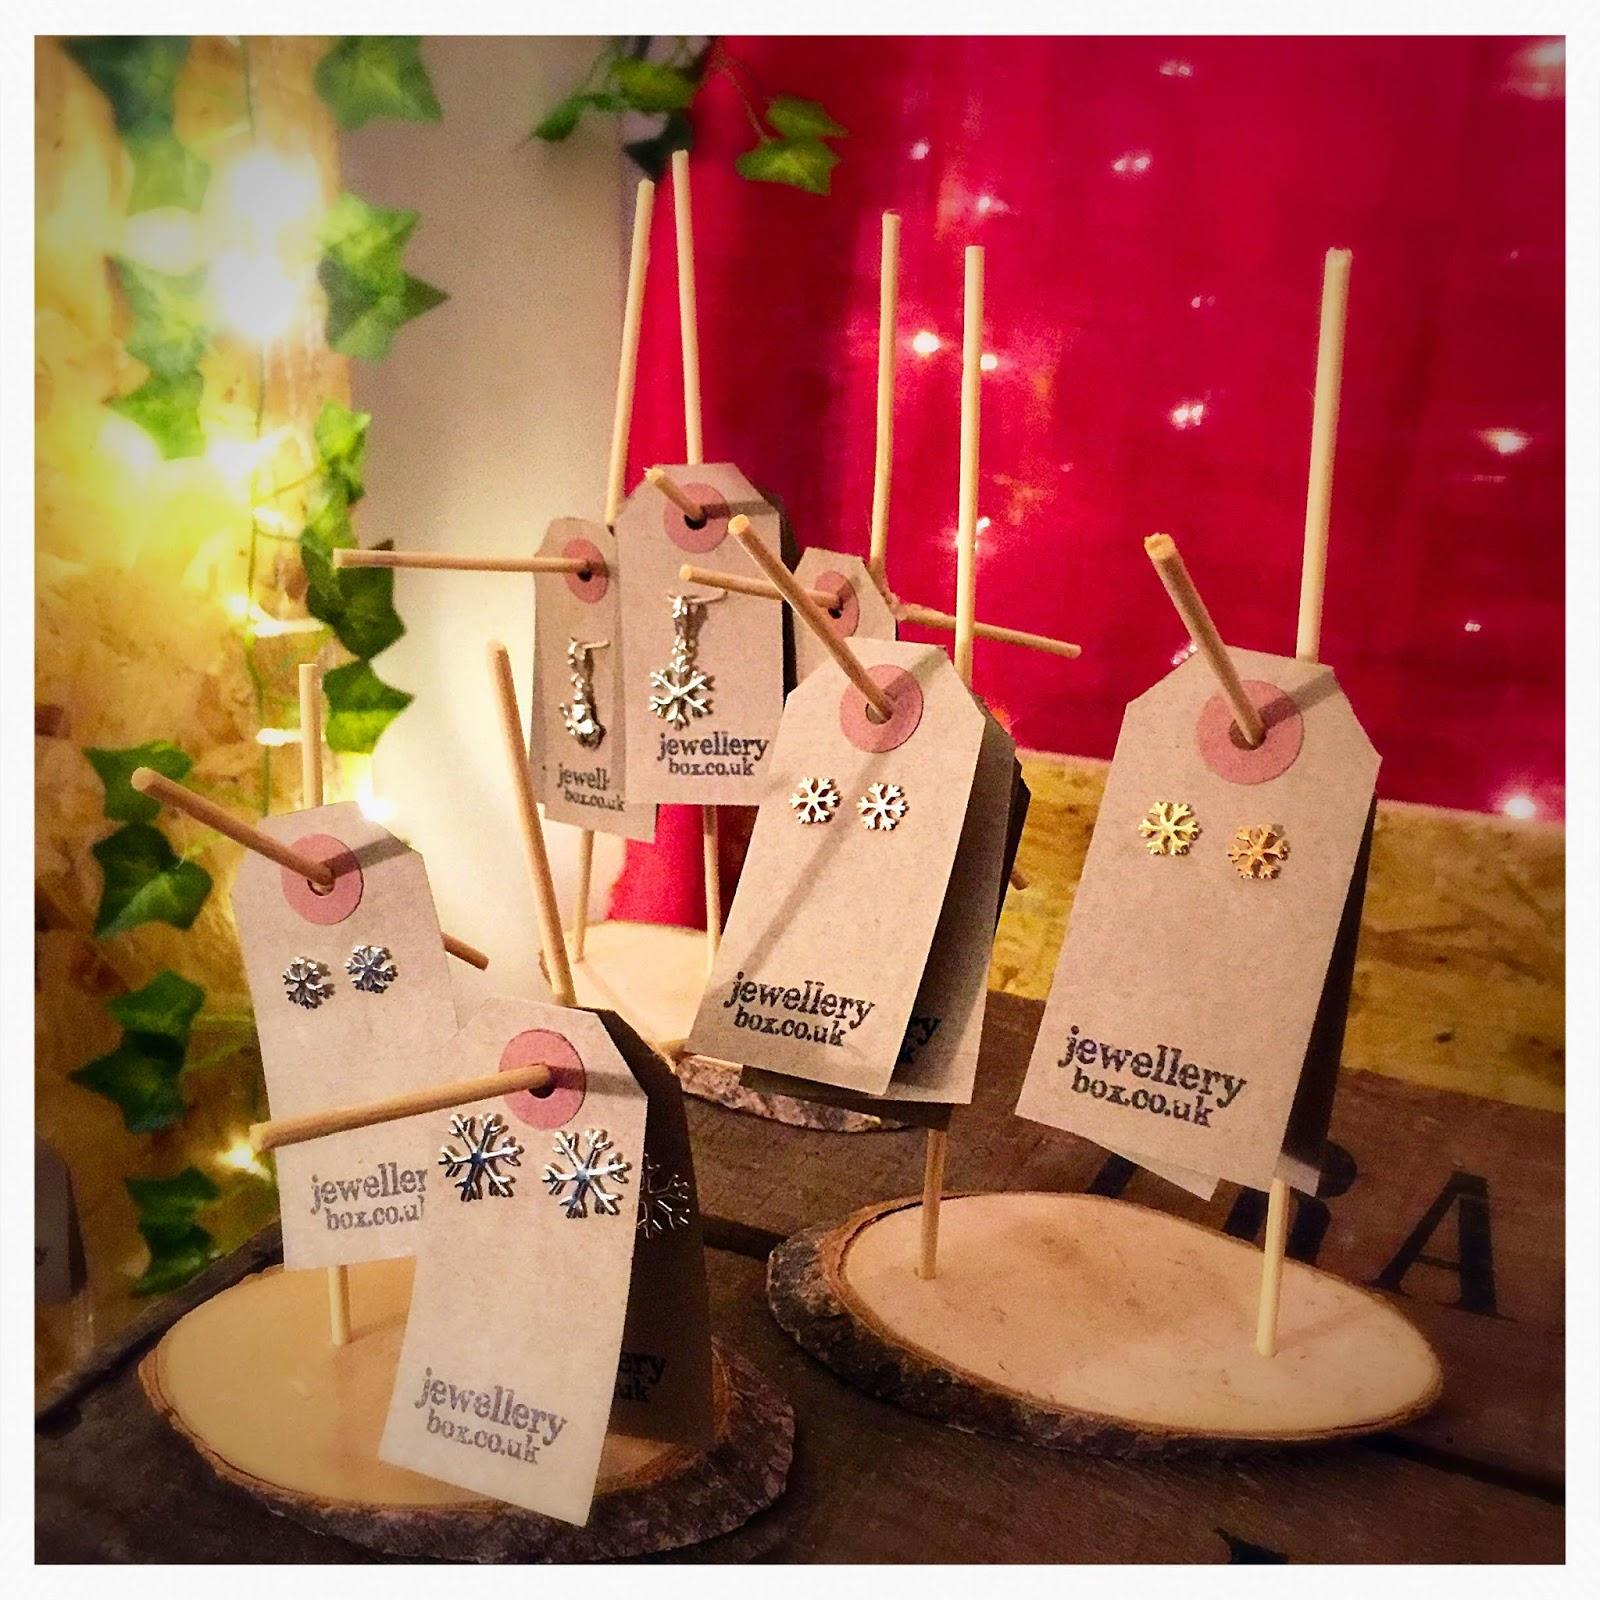 JewelleryBox Christmas Collection